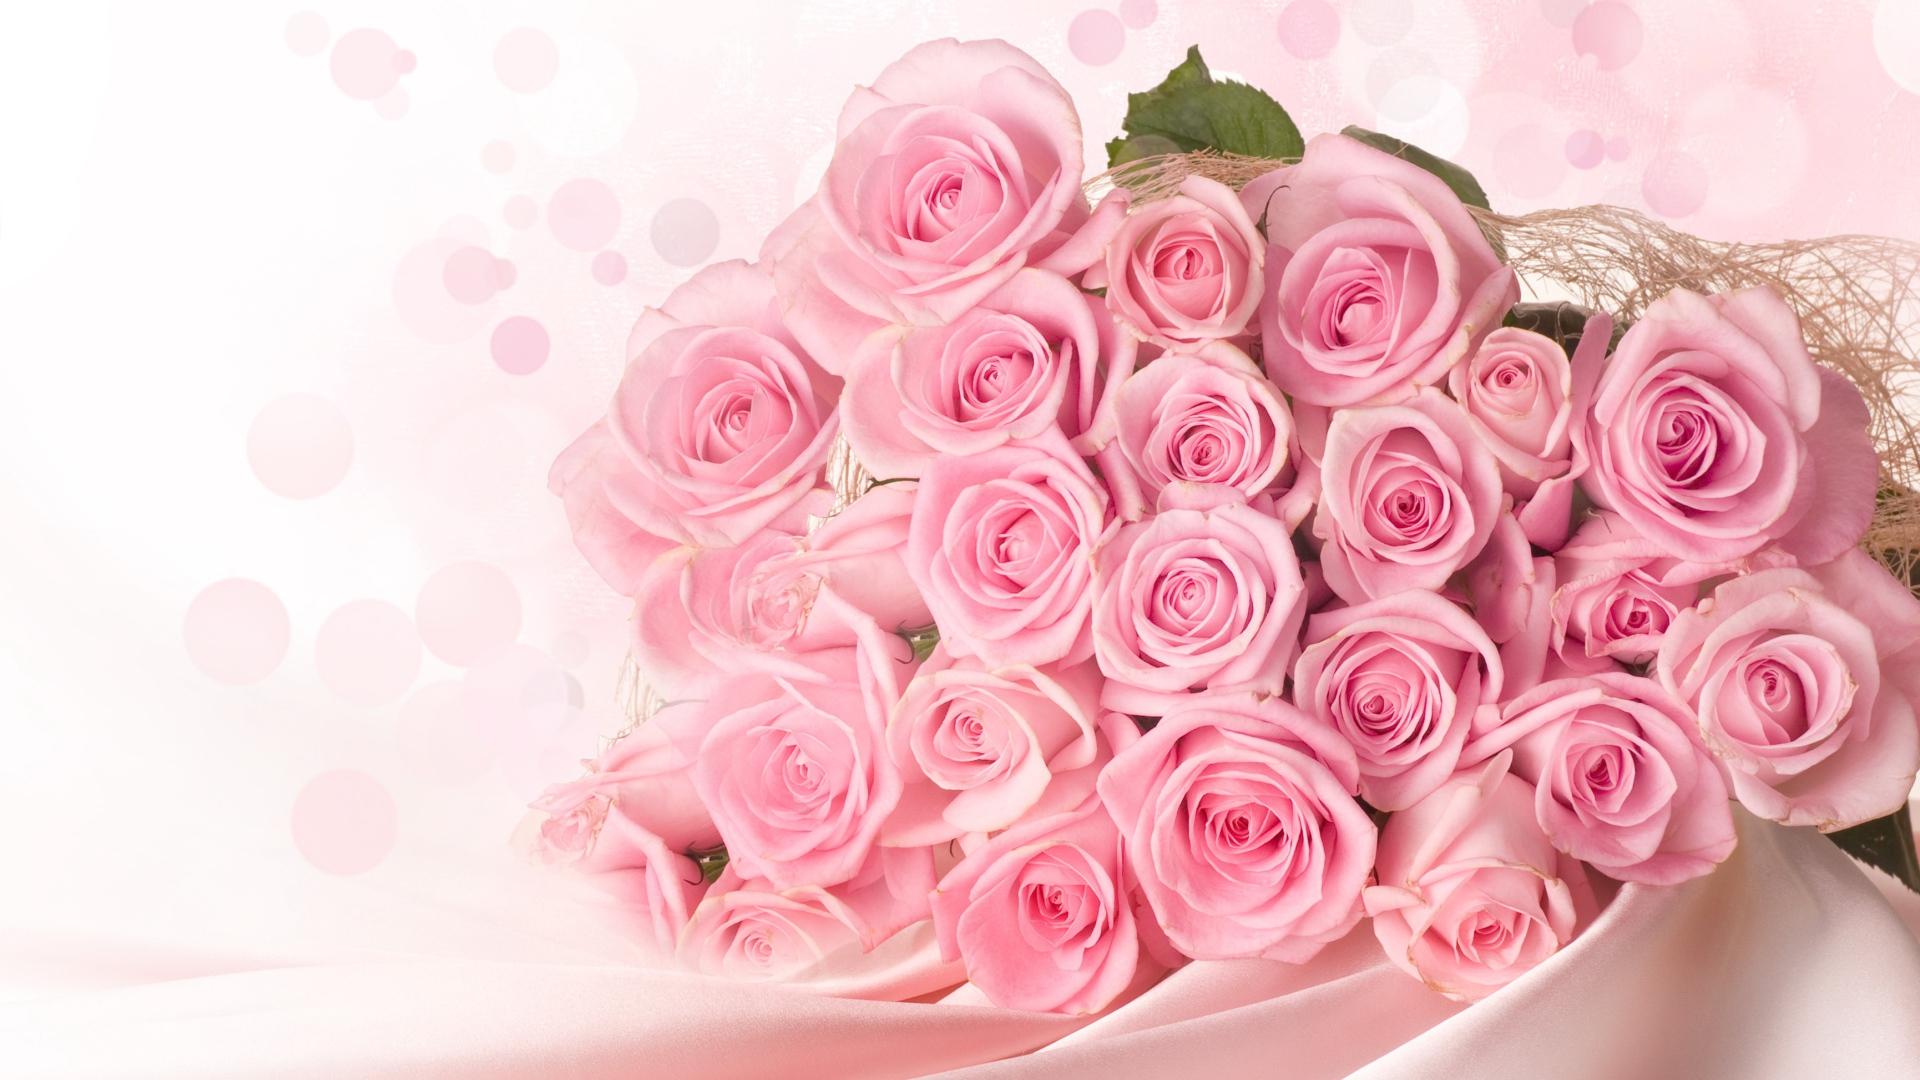 Ночи ангелочками, с днем матери картинки с розами